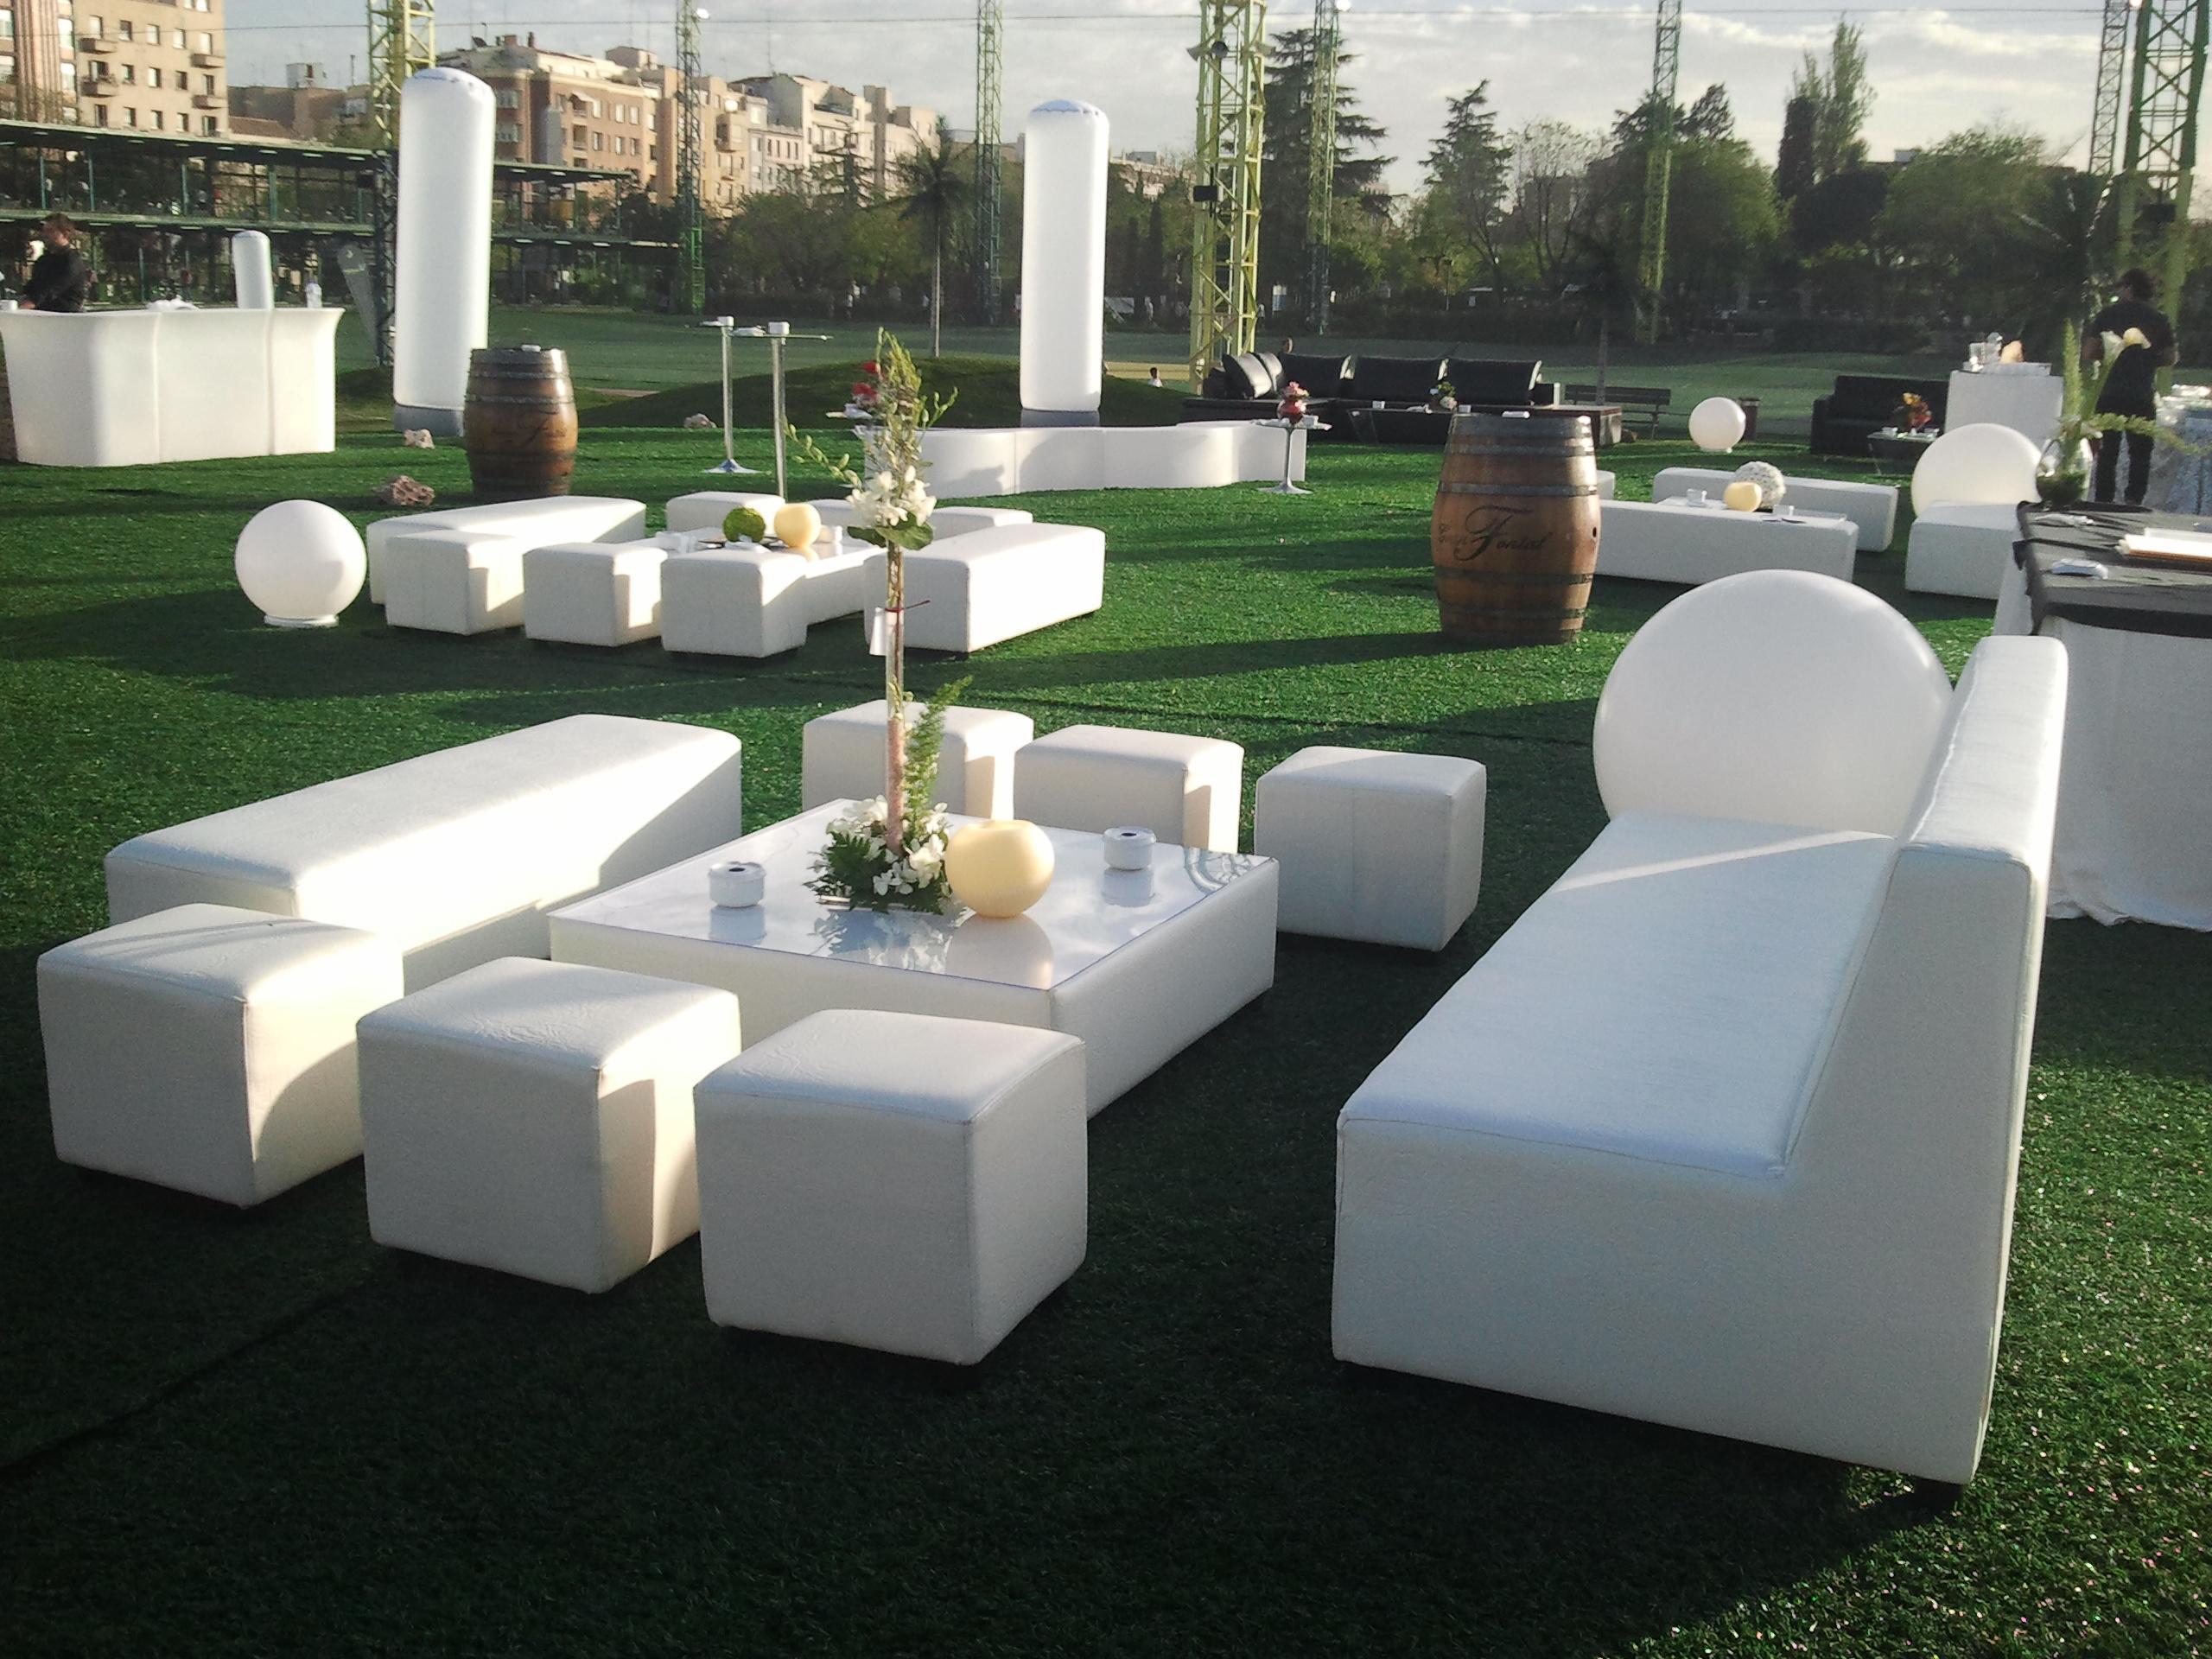 Espacios chill out alquiler de muebles crea tu espacio for Muebles chill out baratos